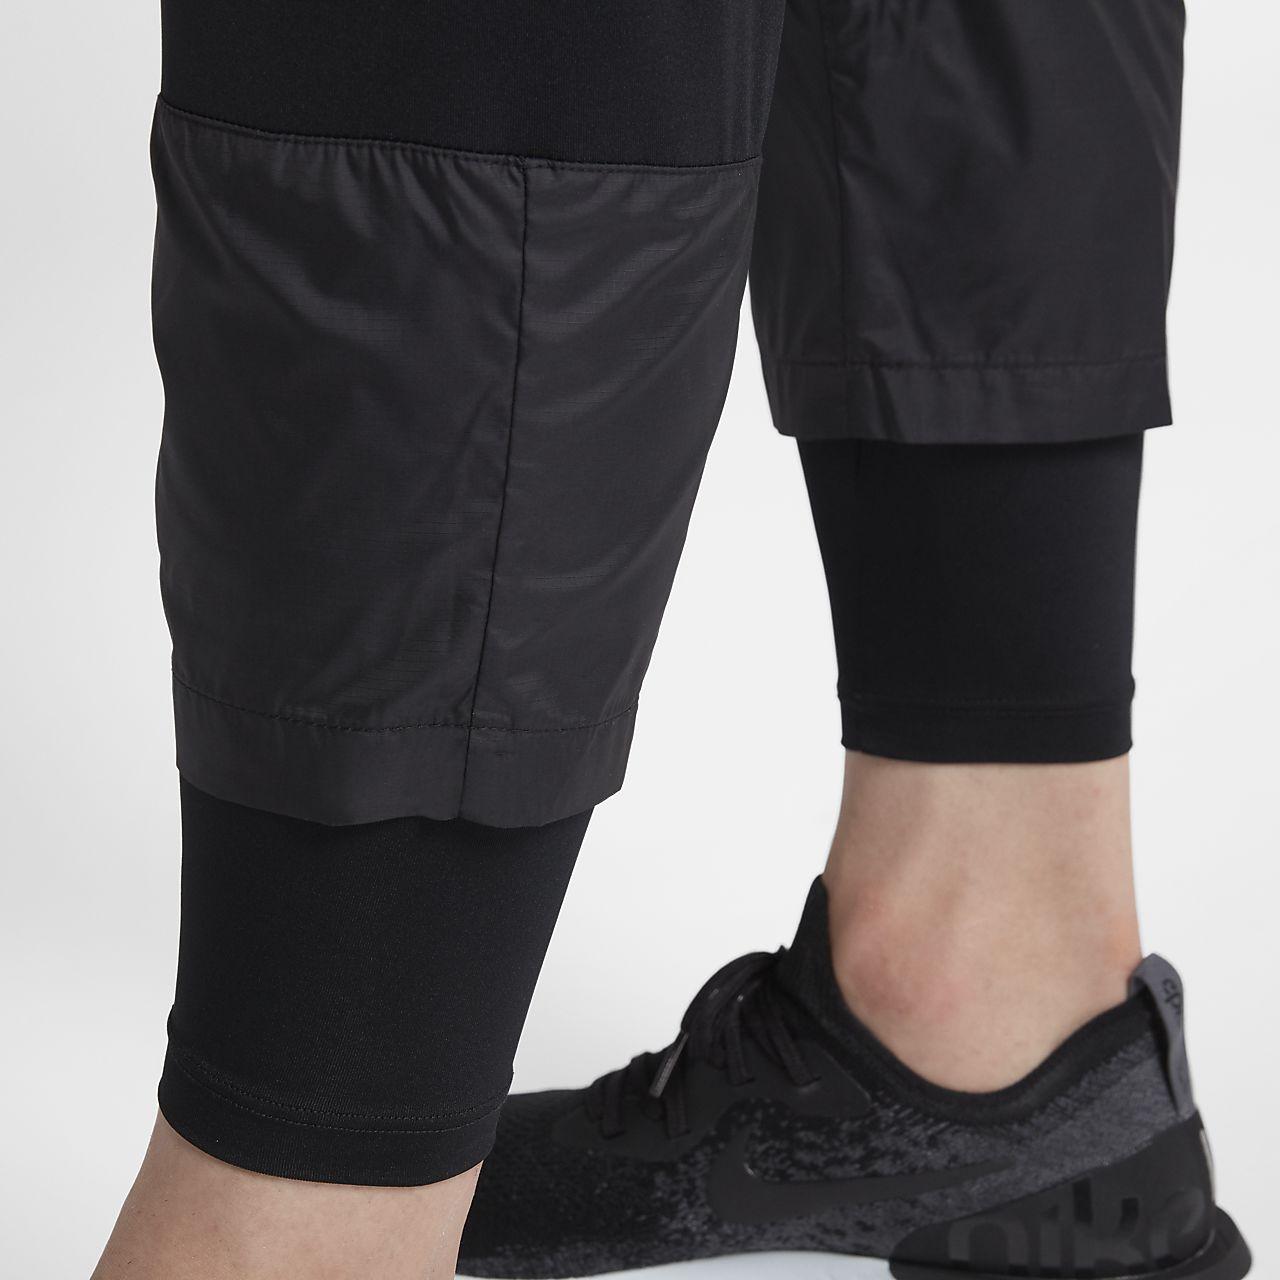 4c7518b0380fd4 Nike Run Division Tech Men s Running Trousers. Nike.com ID